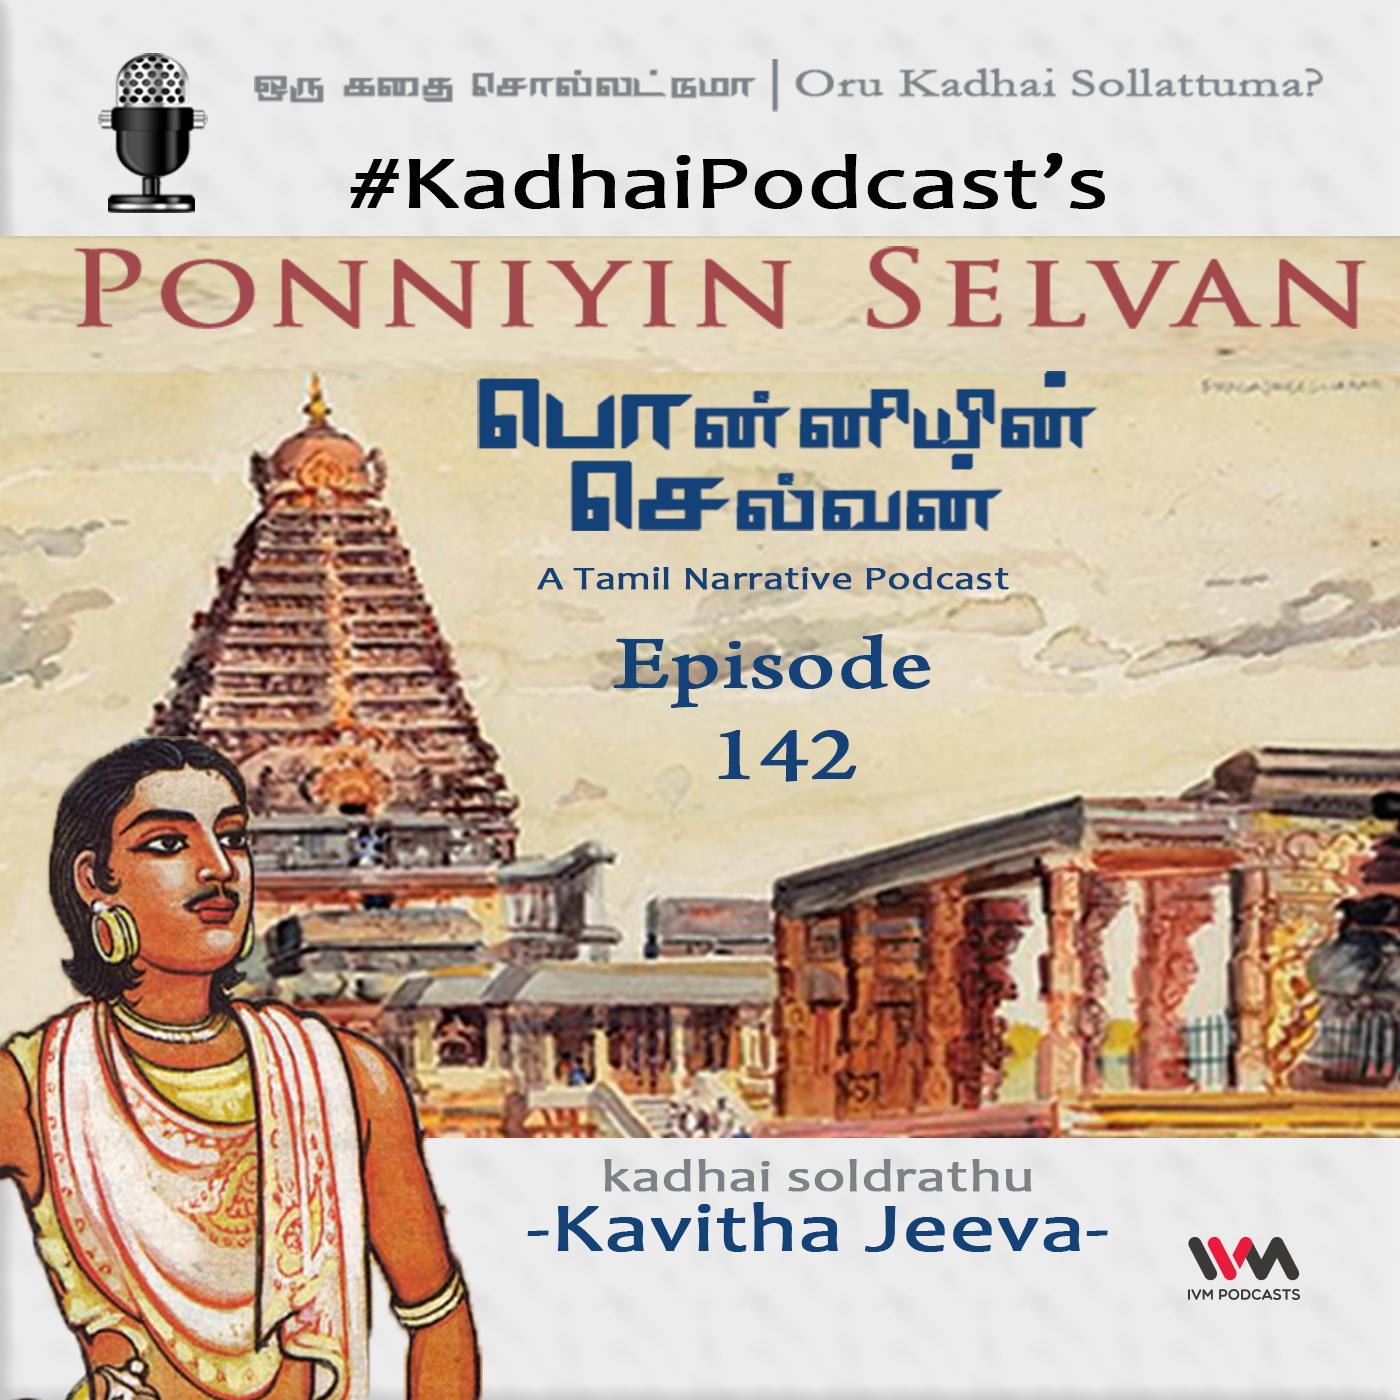 KadhaiPodcast's Ponniyin Selvan - Episode # 142